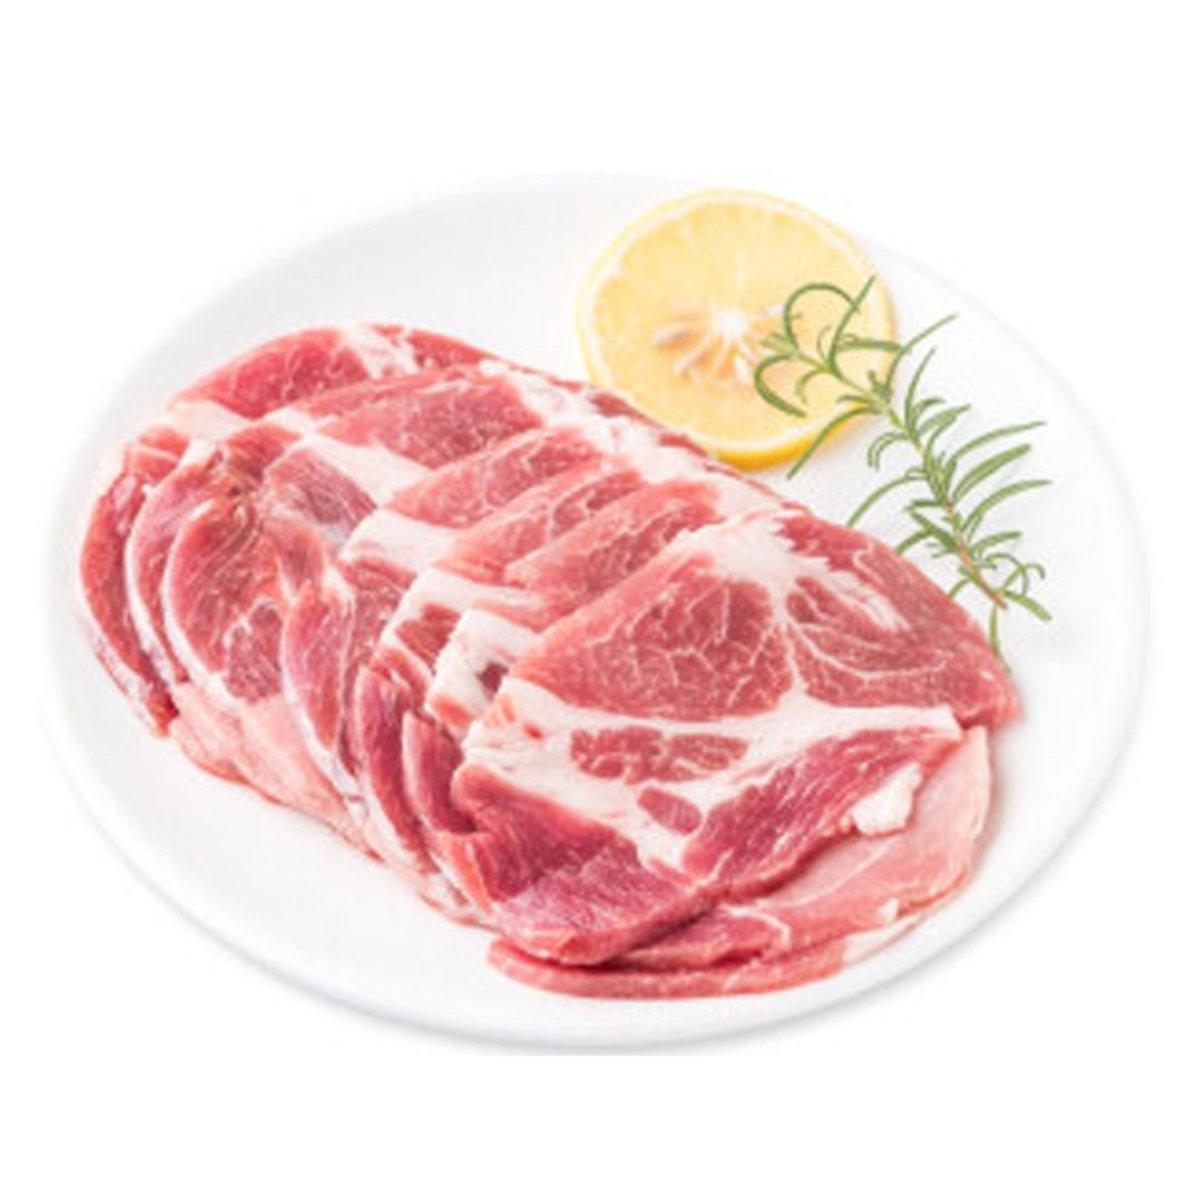 Brazil Frozen Pork Collar Slices 200g (SKU_08547)